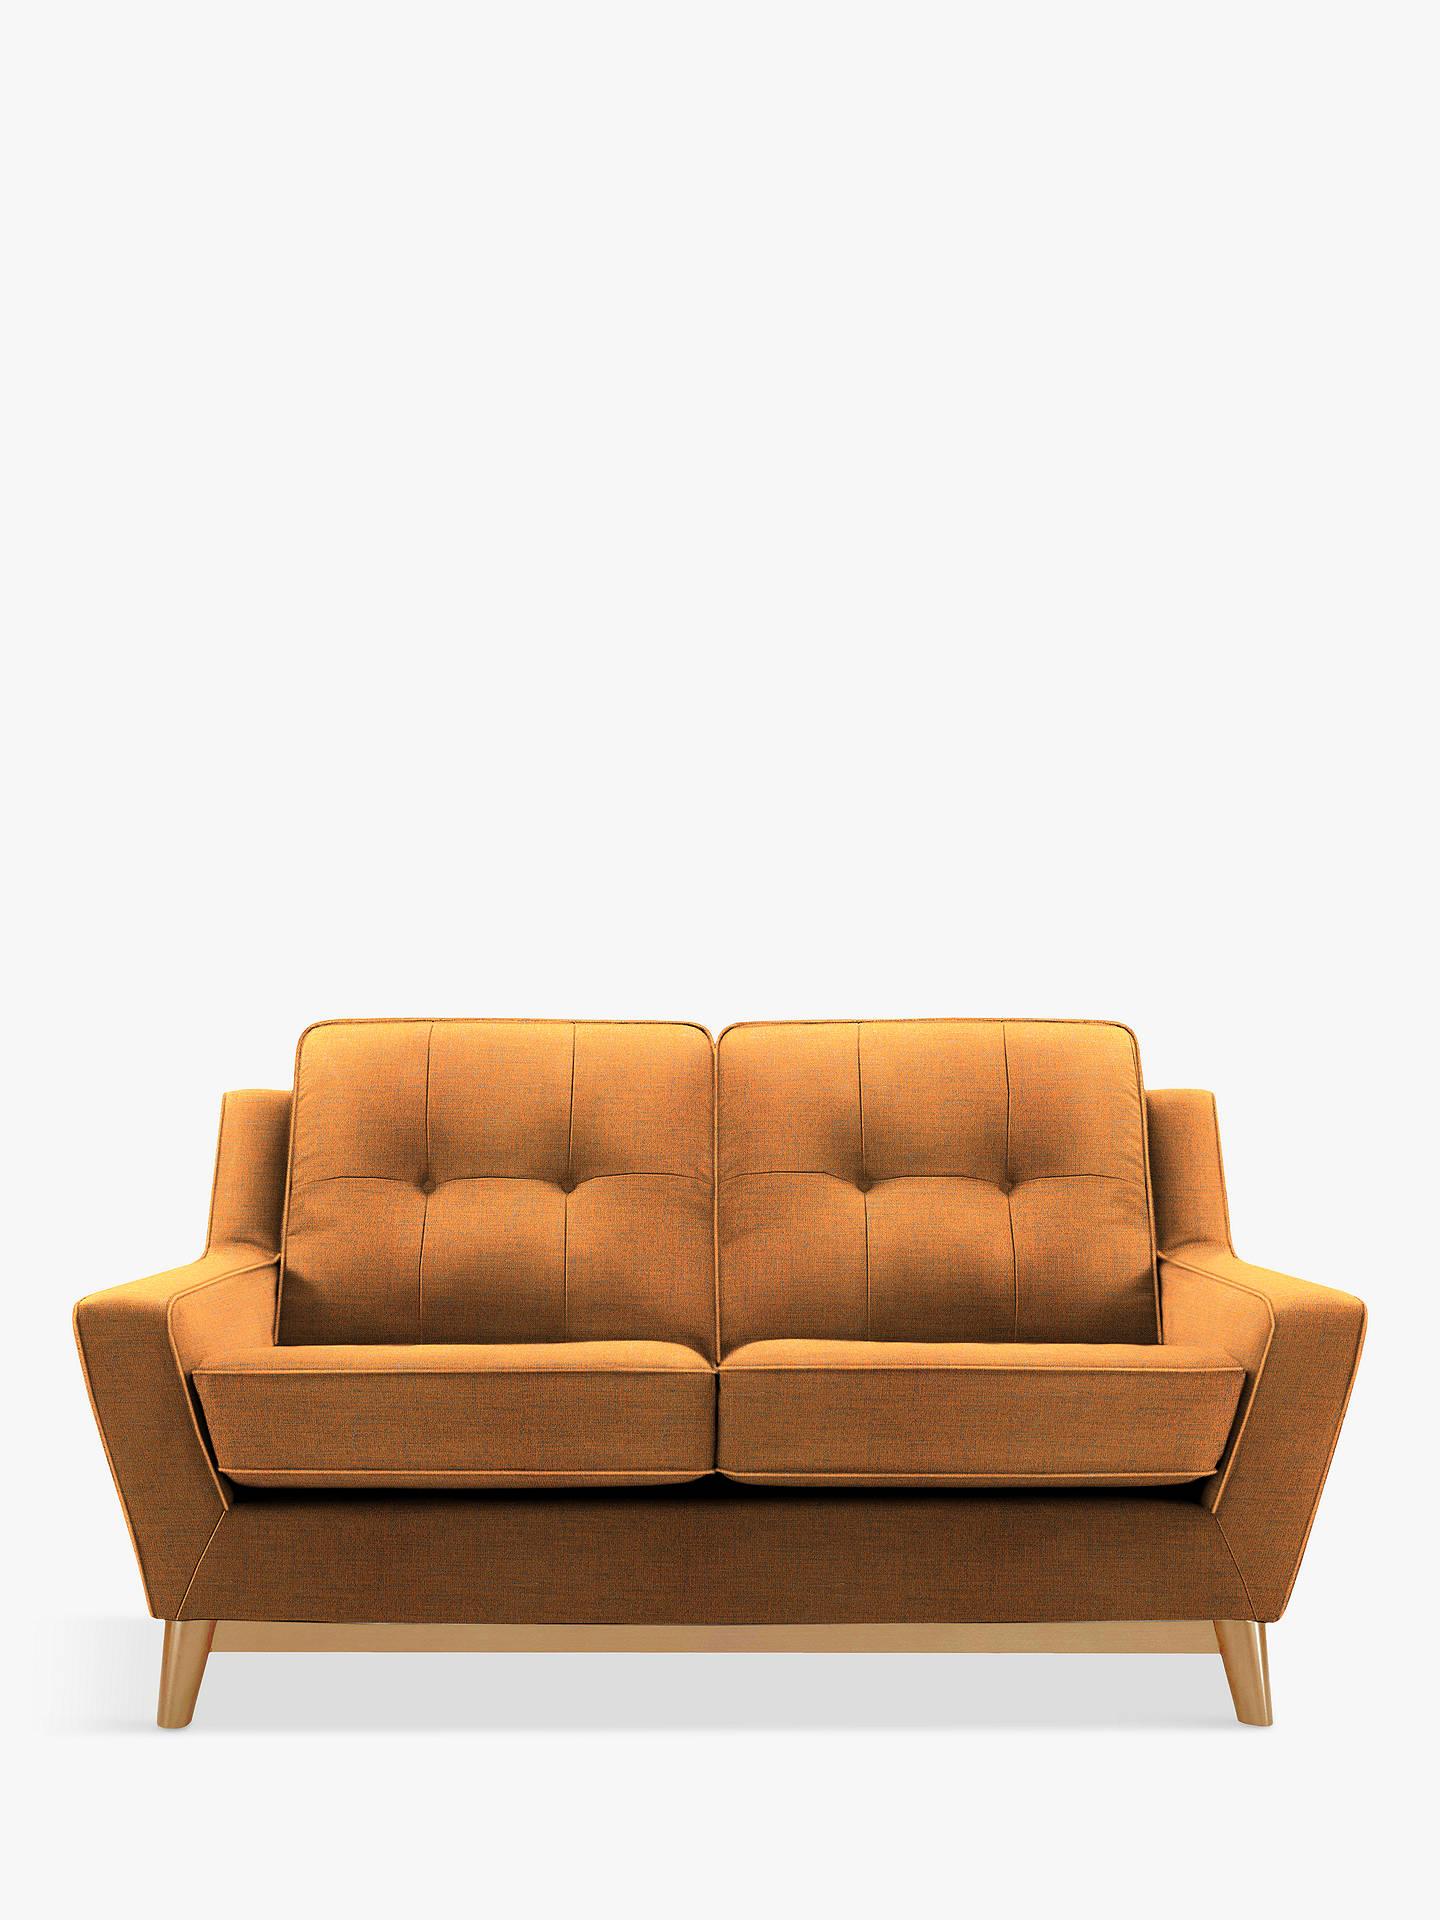 G Plan Vintage The Fifty Three Small 2 Seater Sofa Ash Leg Flurry Tangerine